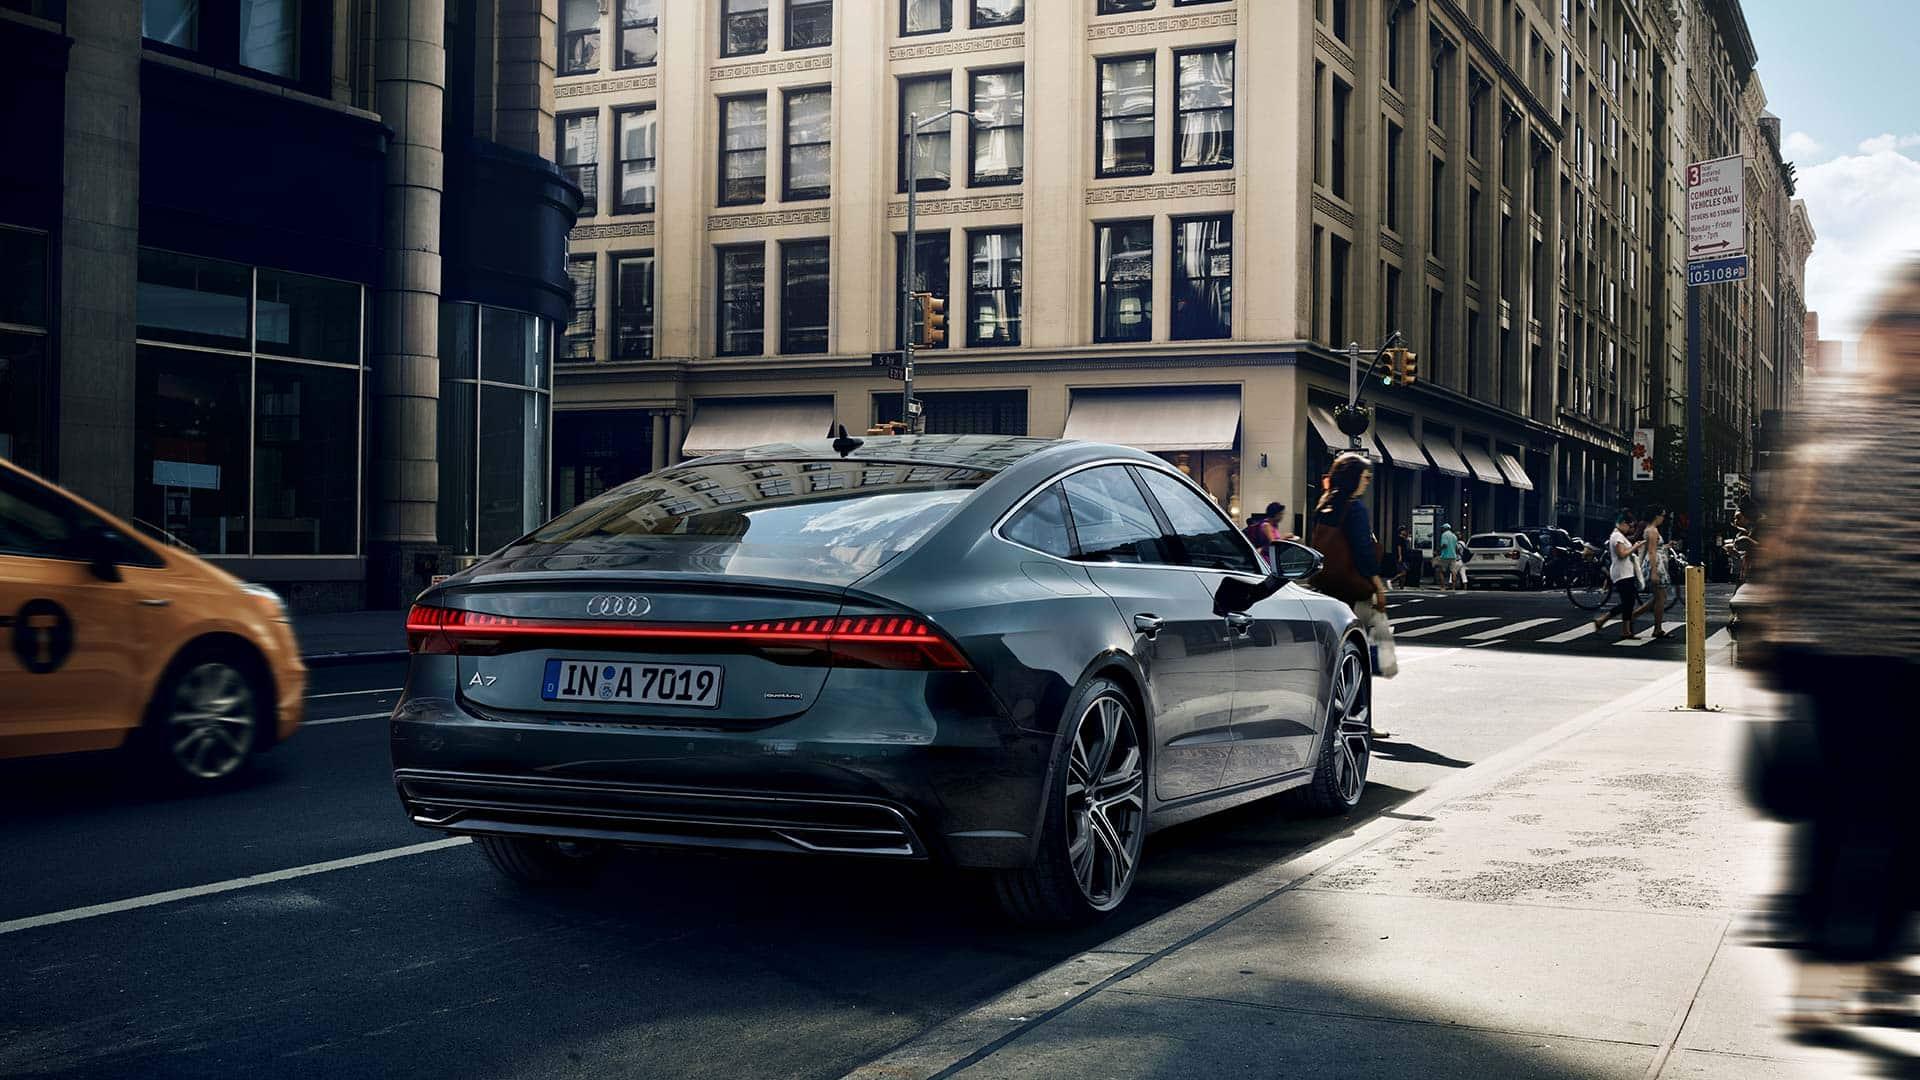 A7 Sportback A7 Audi Deutschland